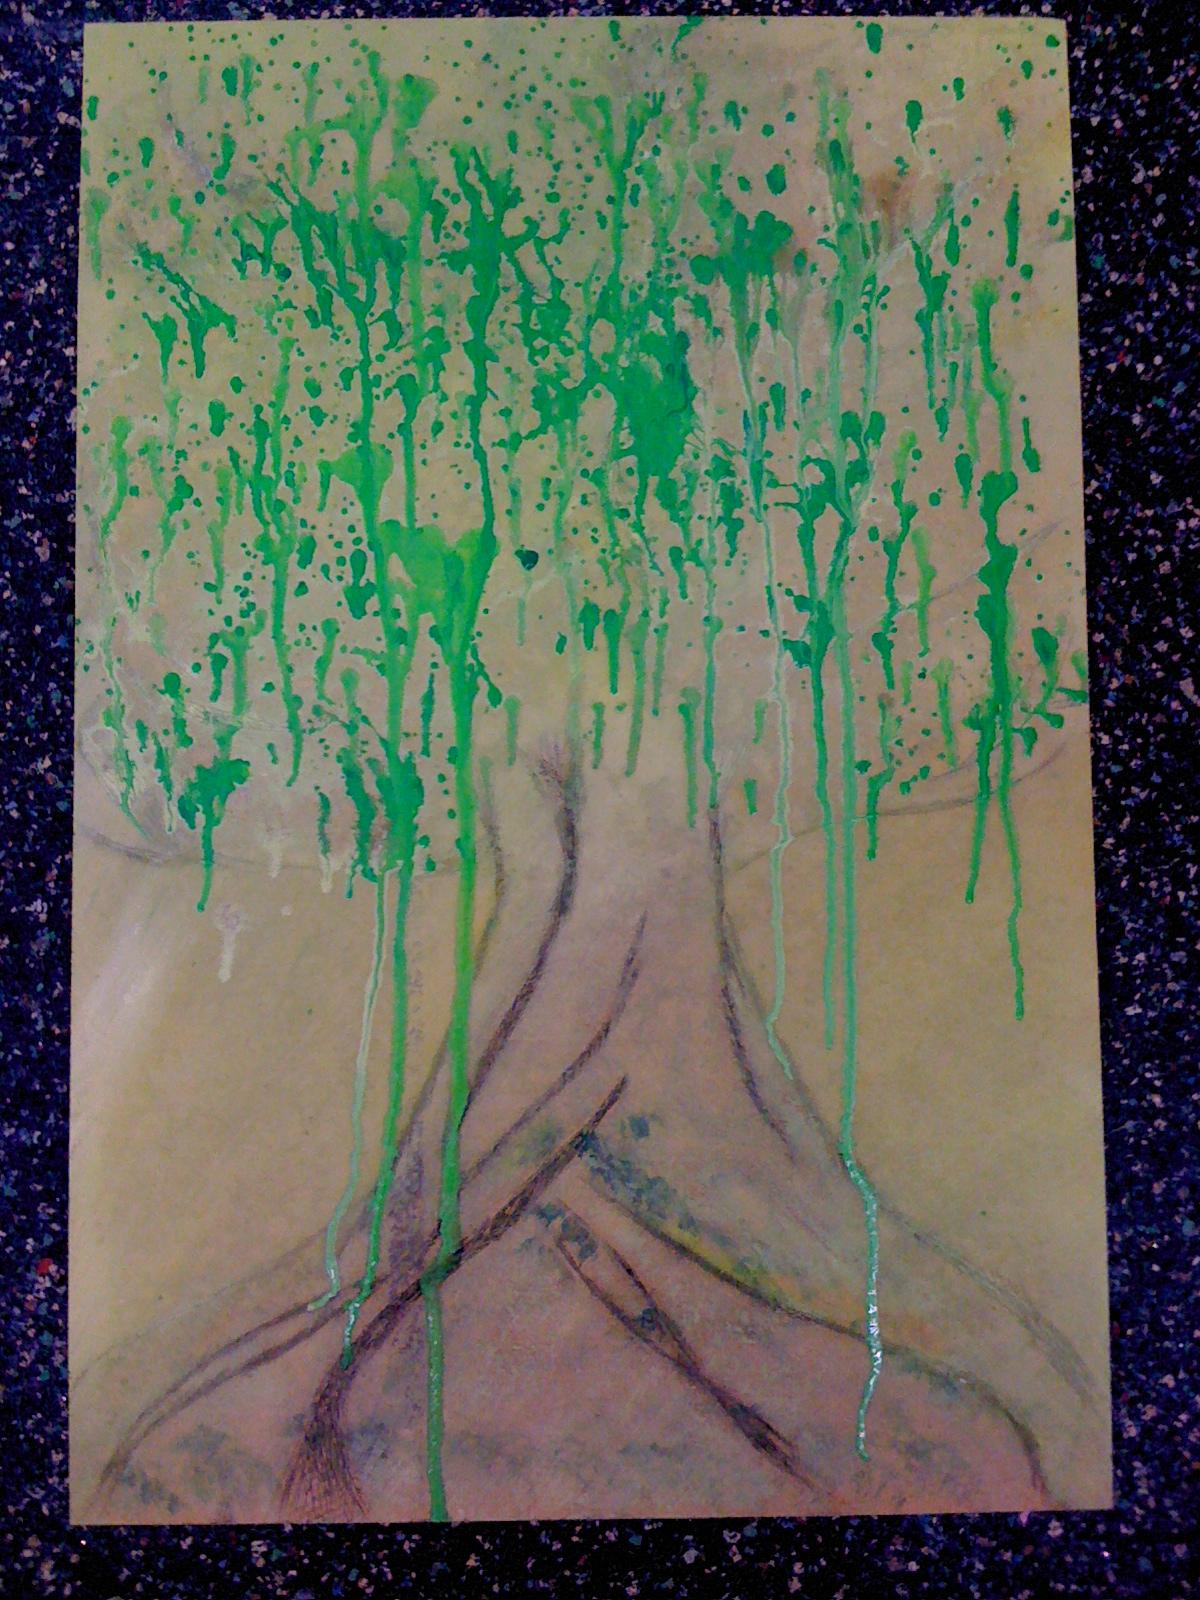 crying tree 哭泣的树